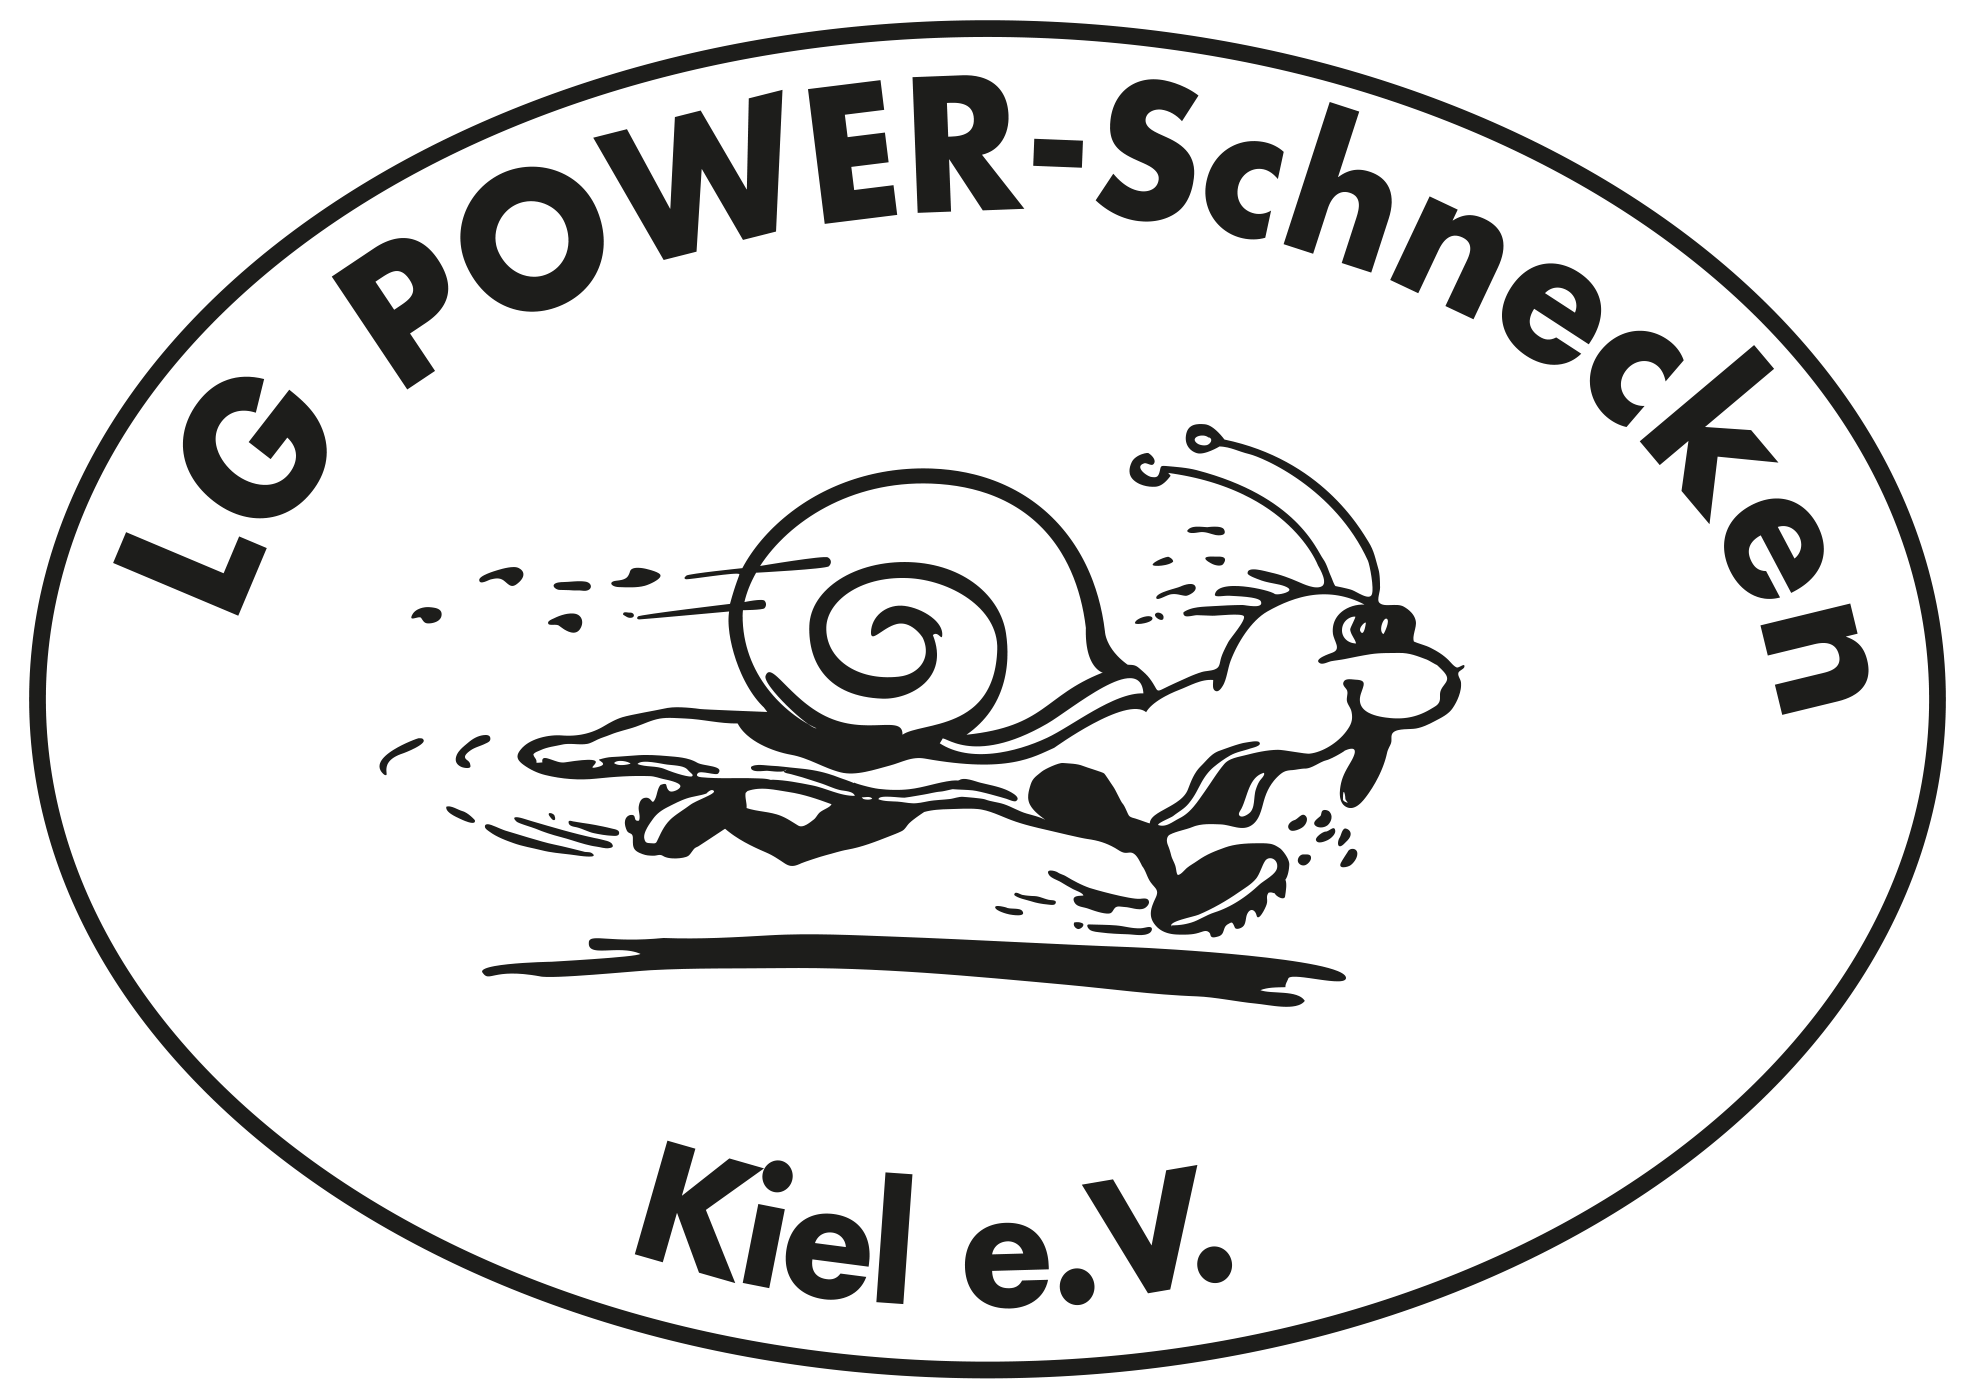 LG POWER-Schnecken Kiel e.V.